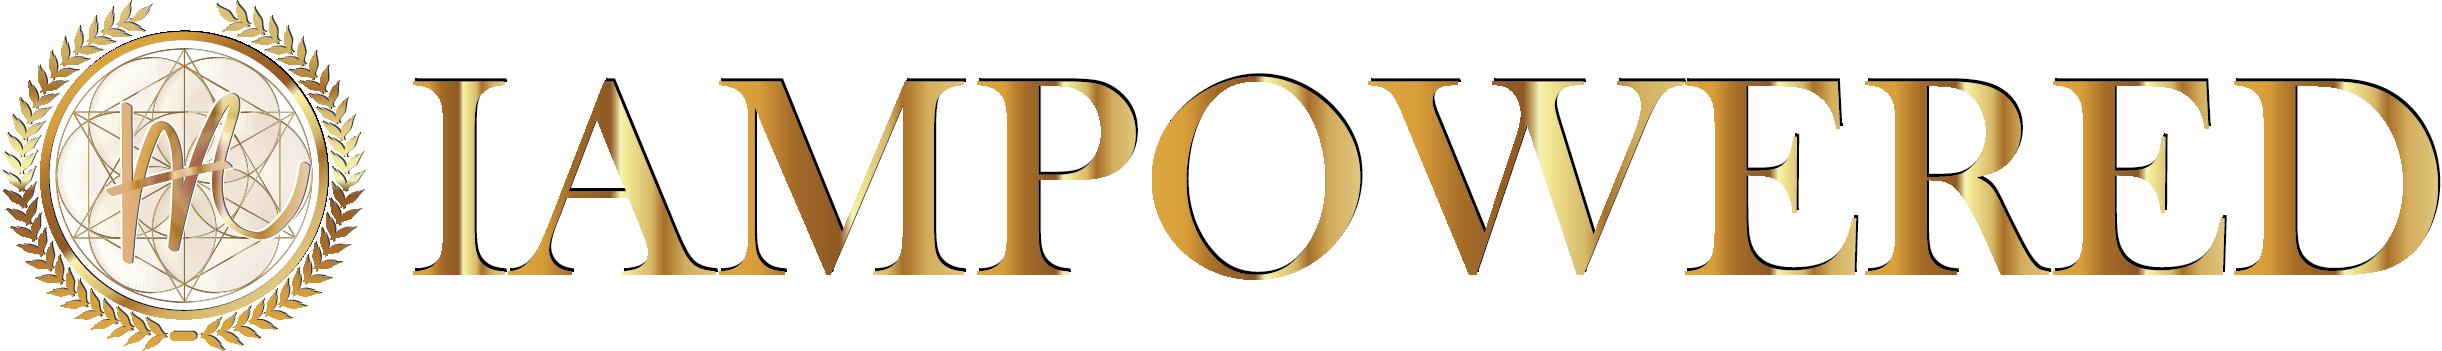 IAMPOWERED ONE LOGO - MAY 2020 - V2 - FULL (small)